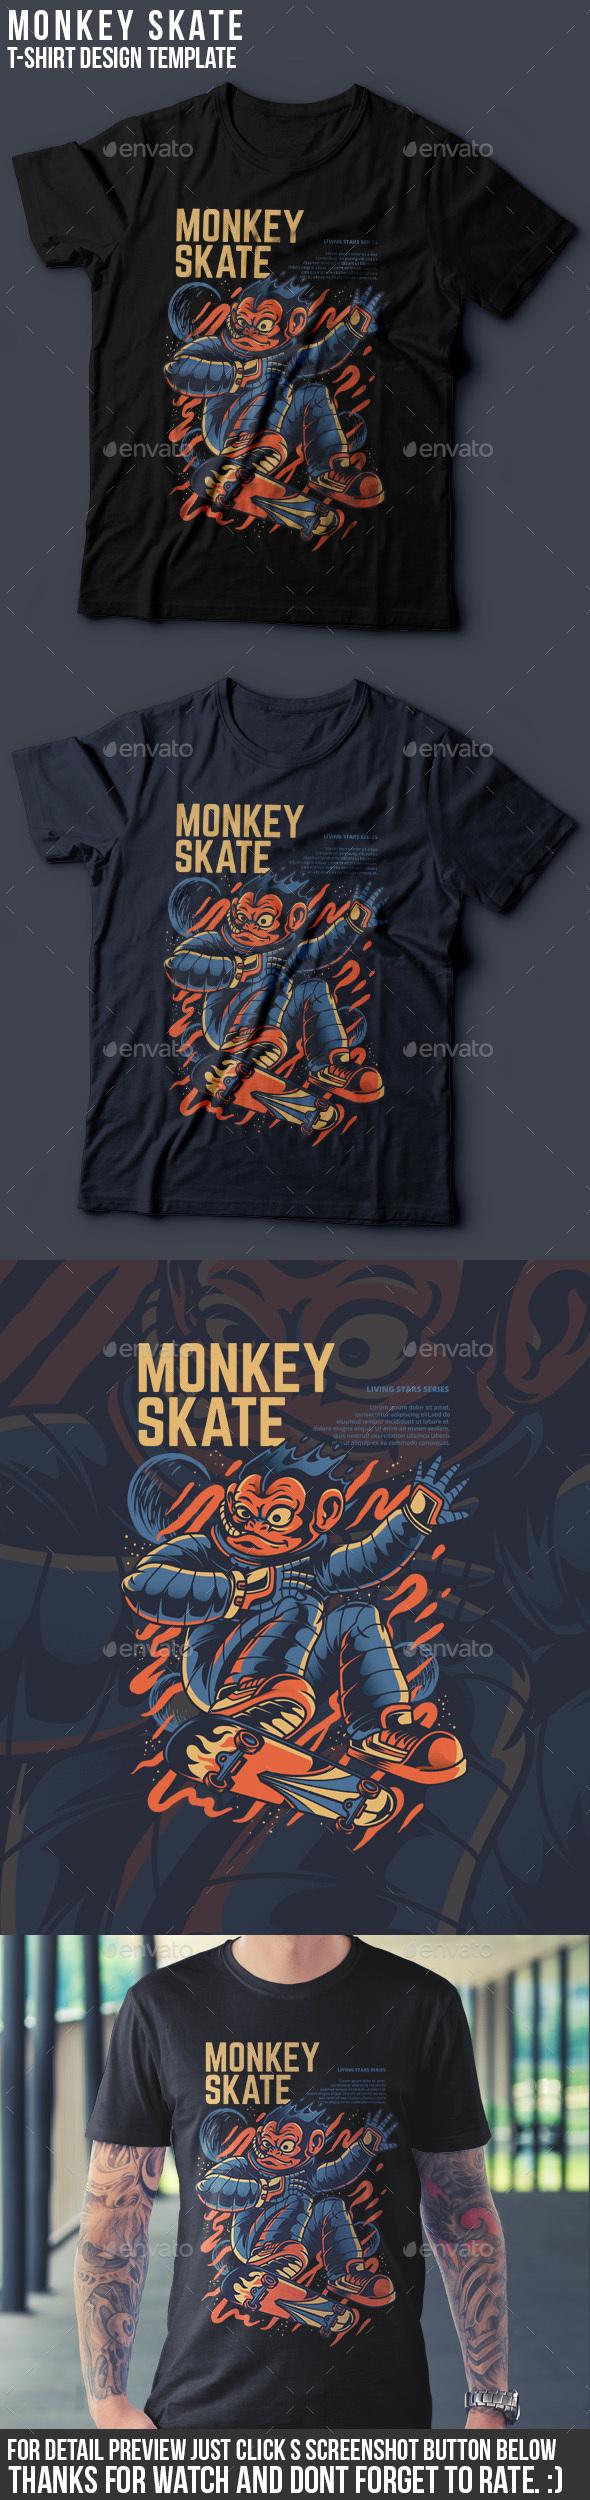 Monkey Skate T-Shirt Design - Funny Designs